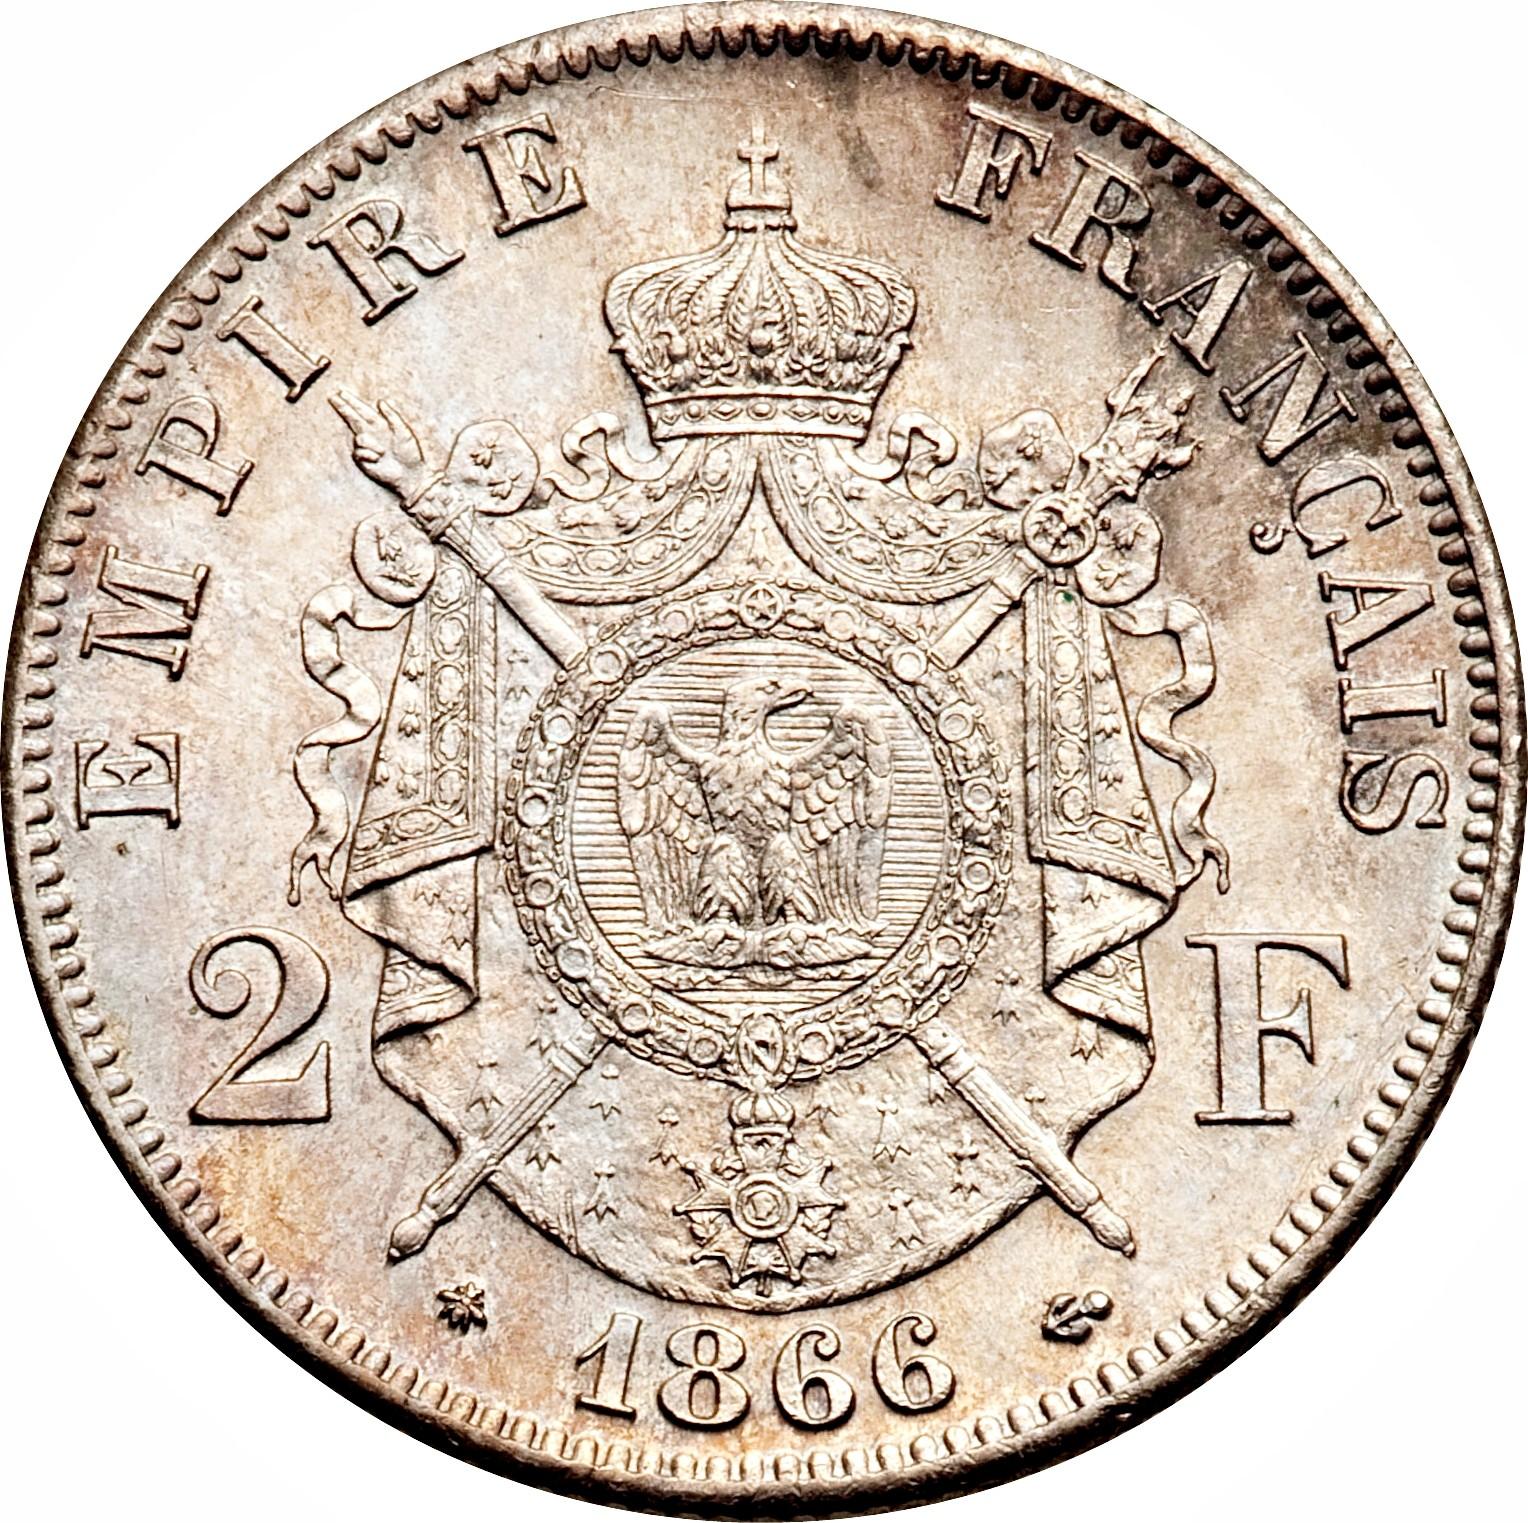 France 2 Francs (1866-1870 Napoleon III)